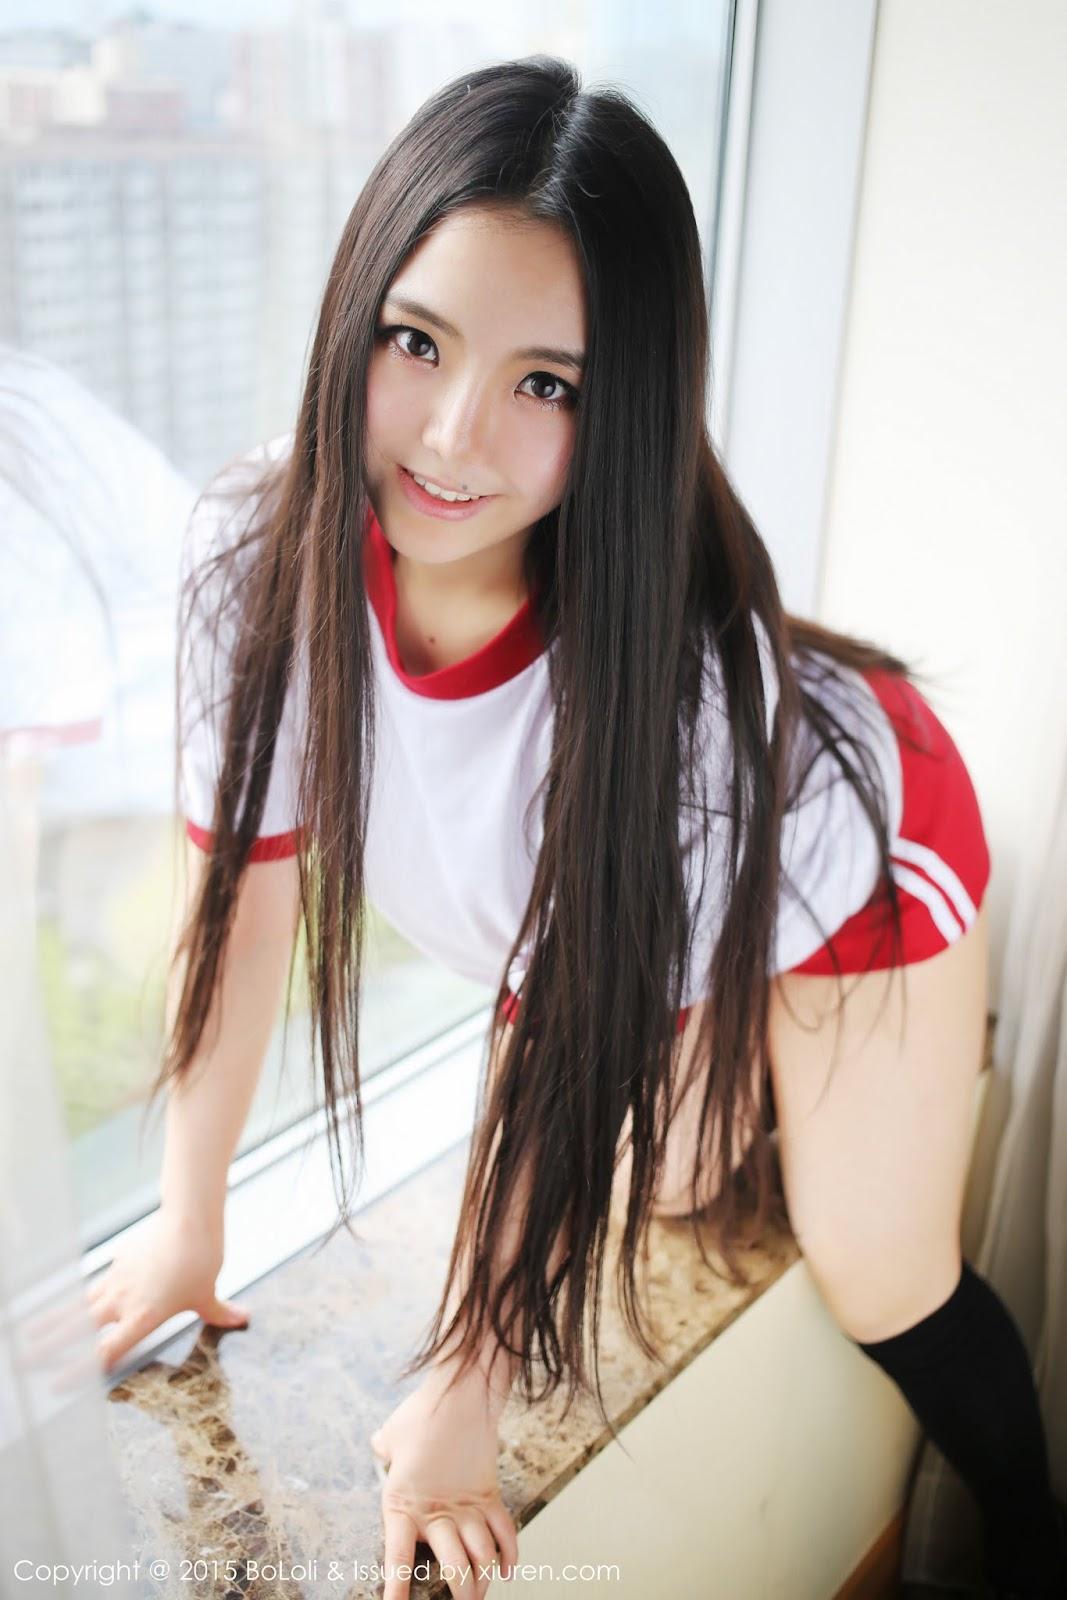 0008 - Hot Girl Model BOLOLI VOL.12